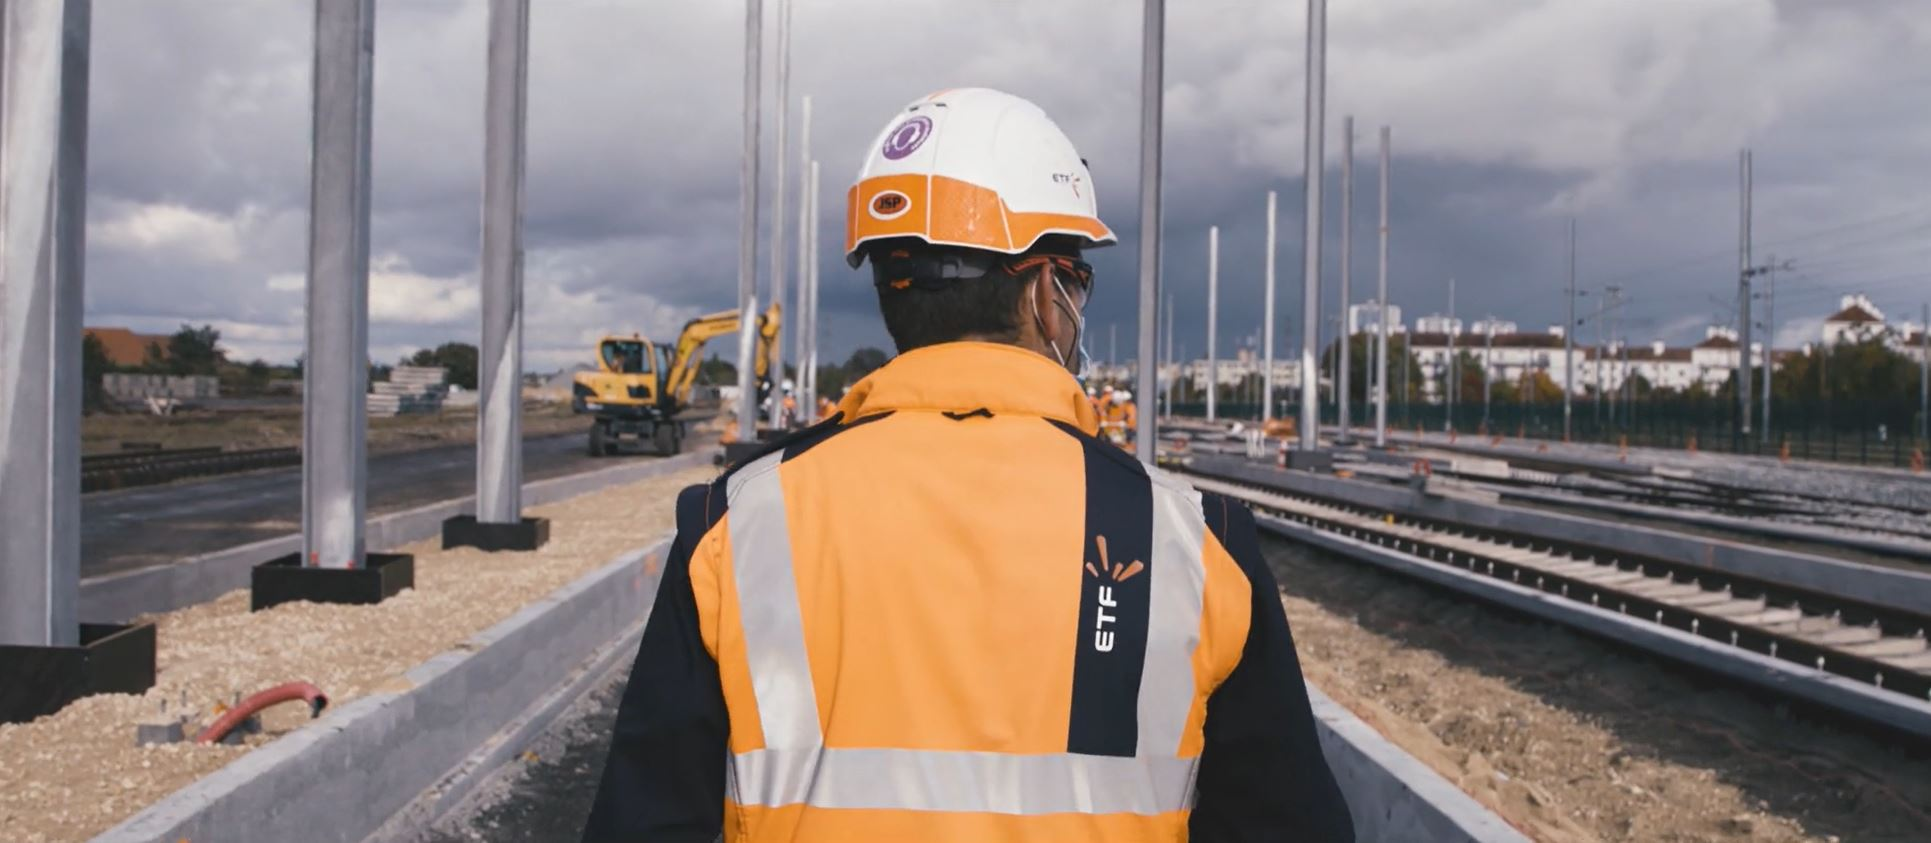 Track renewal project, France, ETF